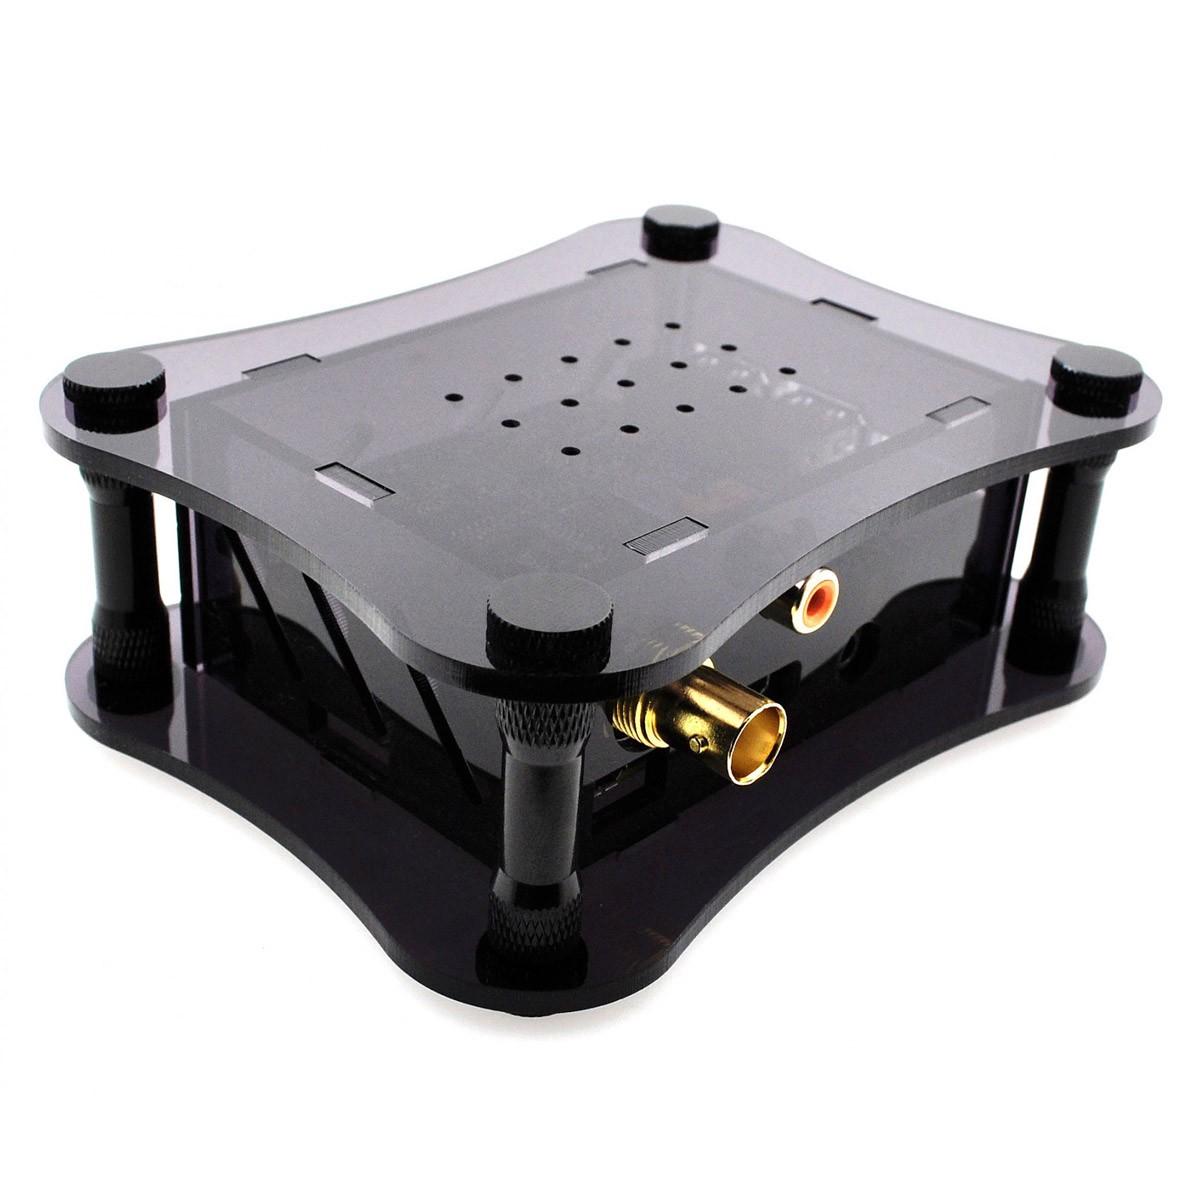 ALLO DIGIONE PLAYER Streamer Raspberry Pi 4 B Digital Interface DigiOne Volumio Pre-Installed Black